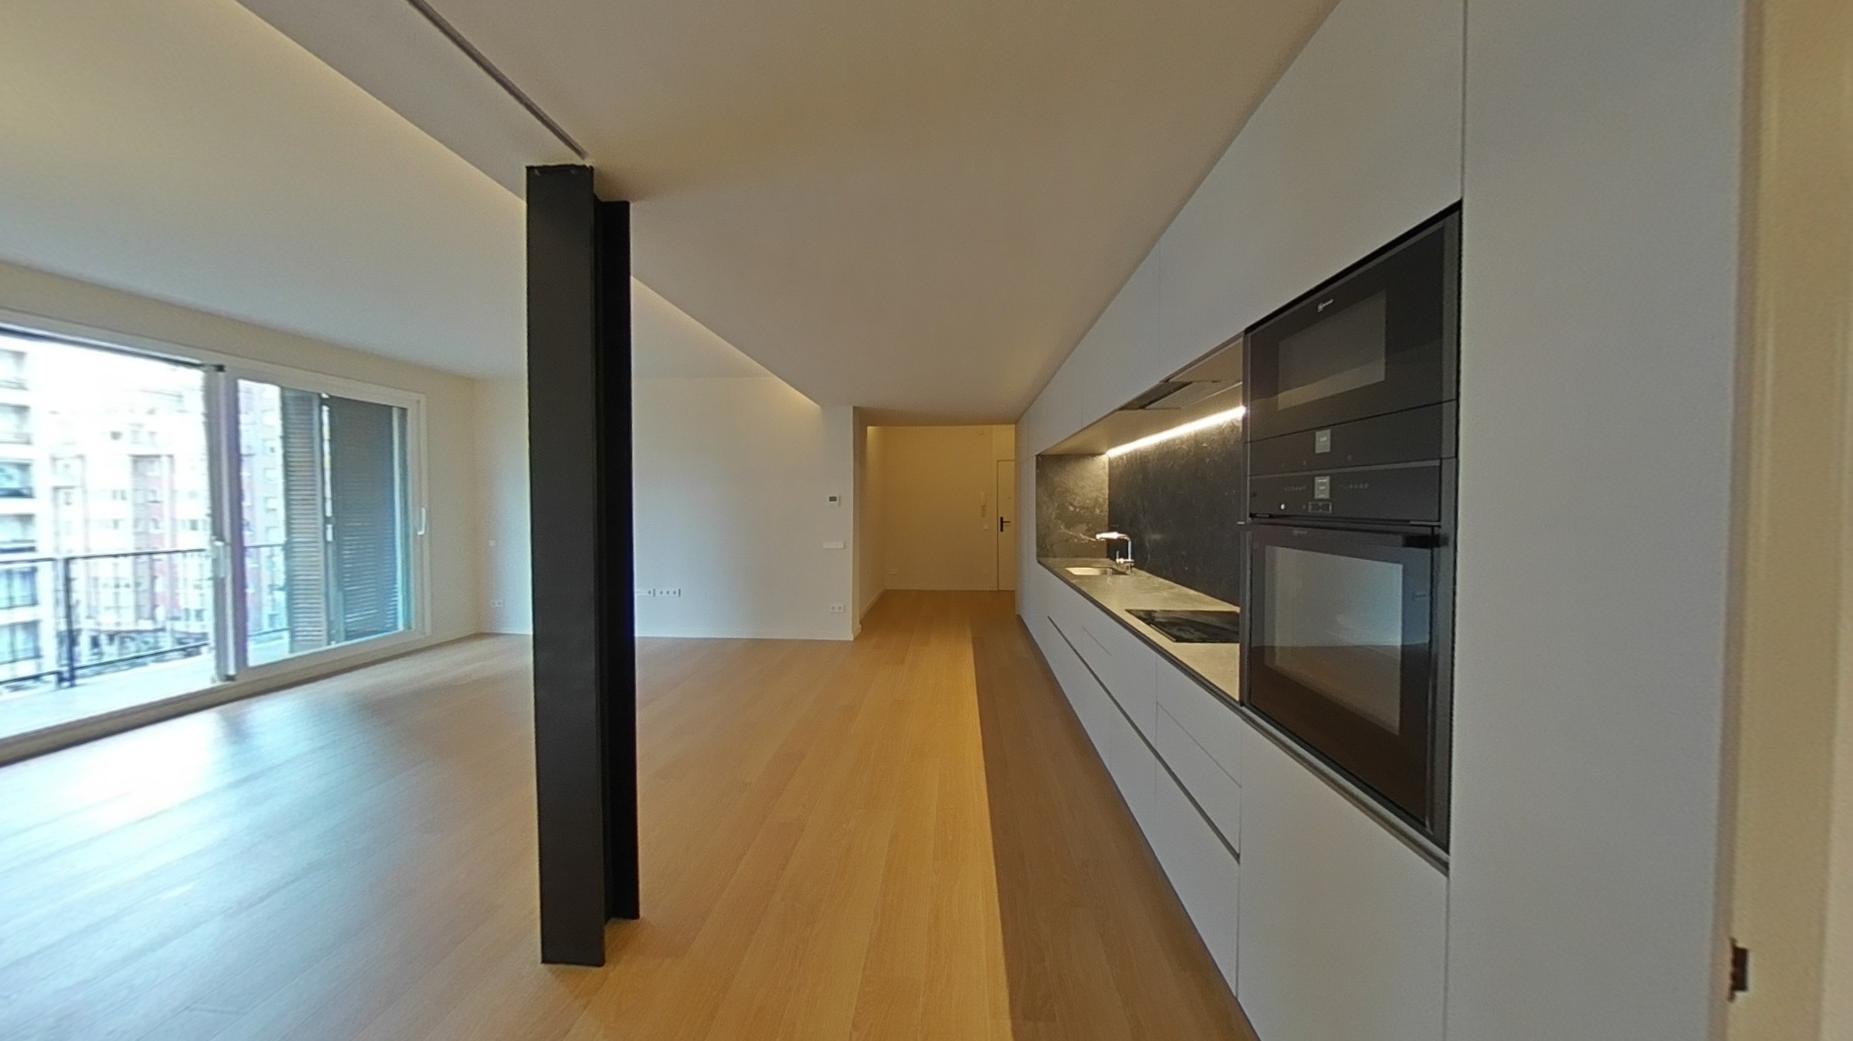 253492 Flat for sale in Sarrià-Sant Gervasi, Sant Gervasi-Galvany 4